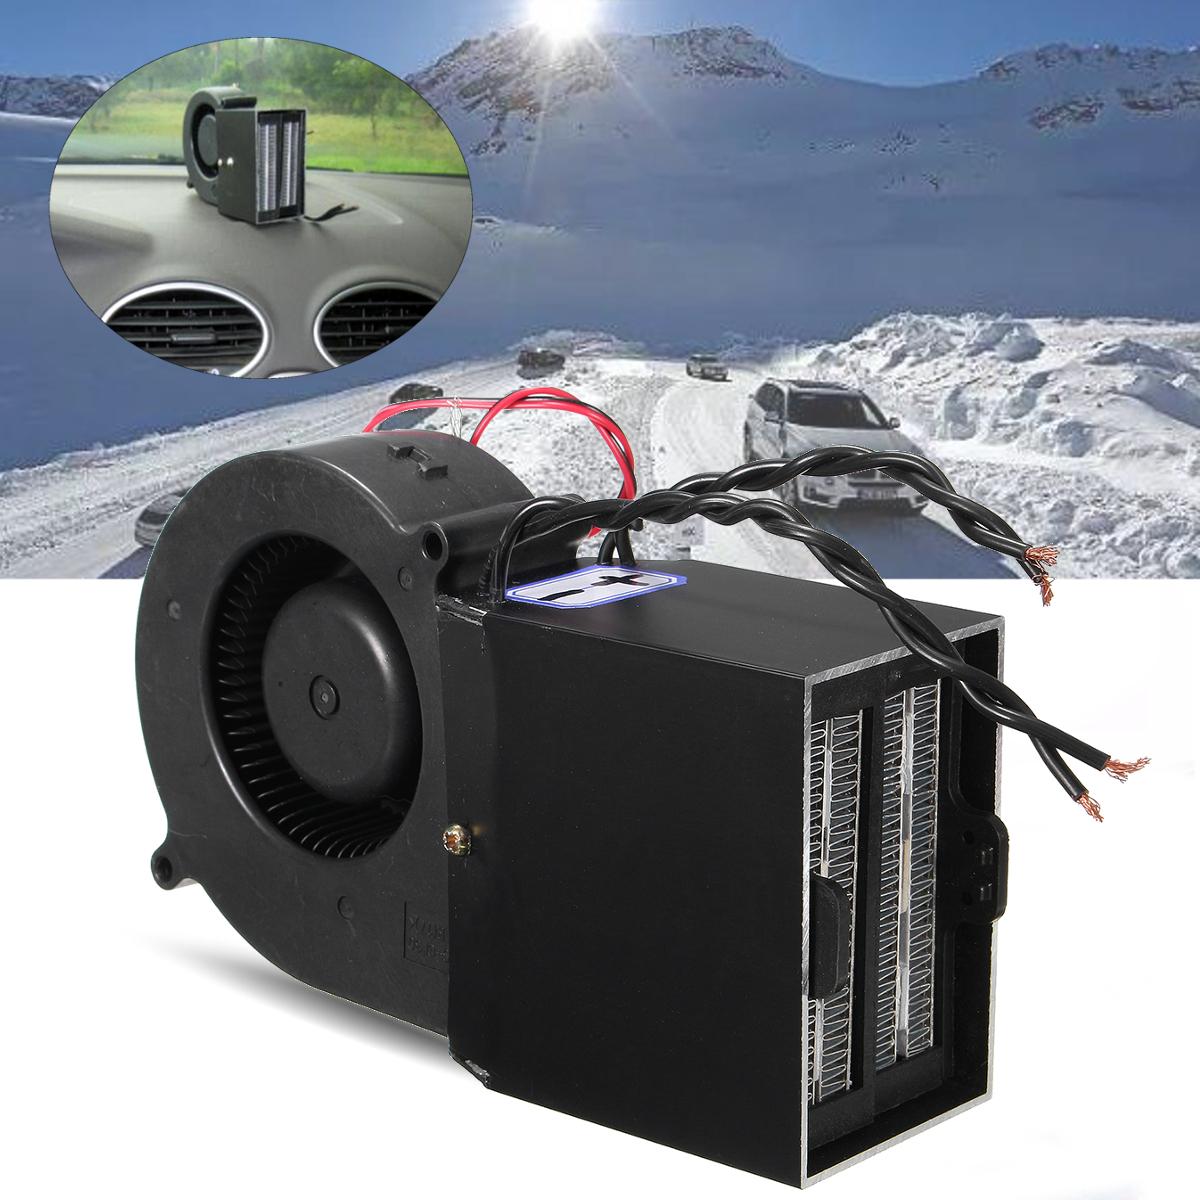 12 PTC 300w 500w Car Portable Adjustable Heating Heater